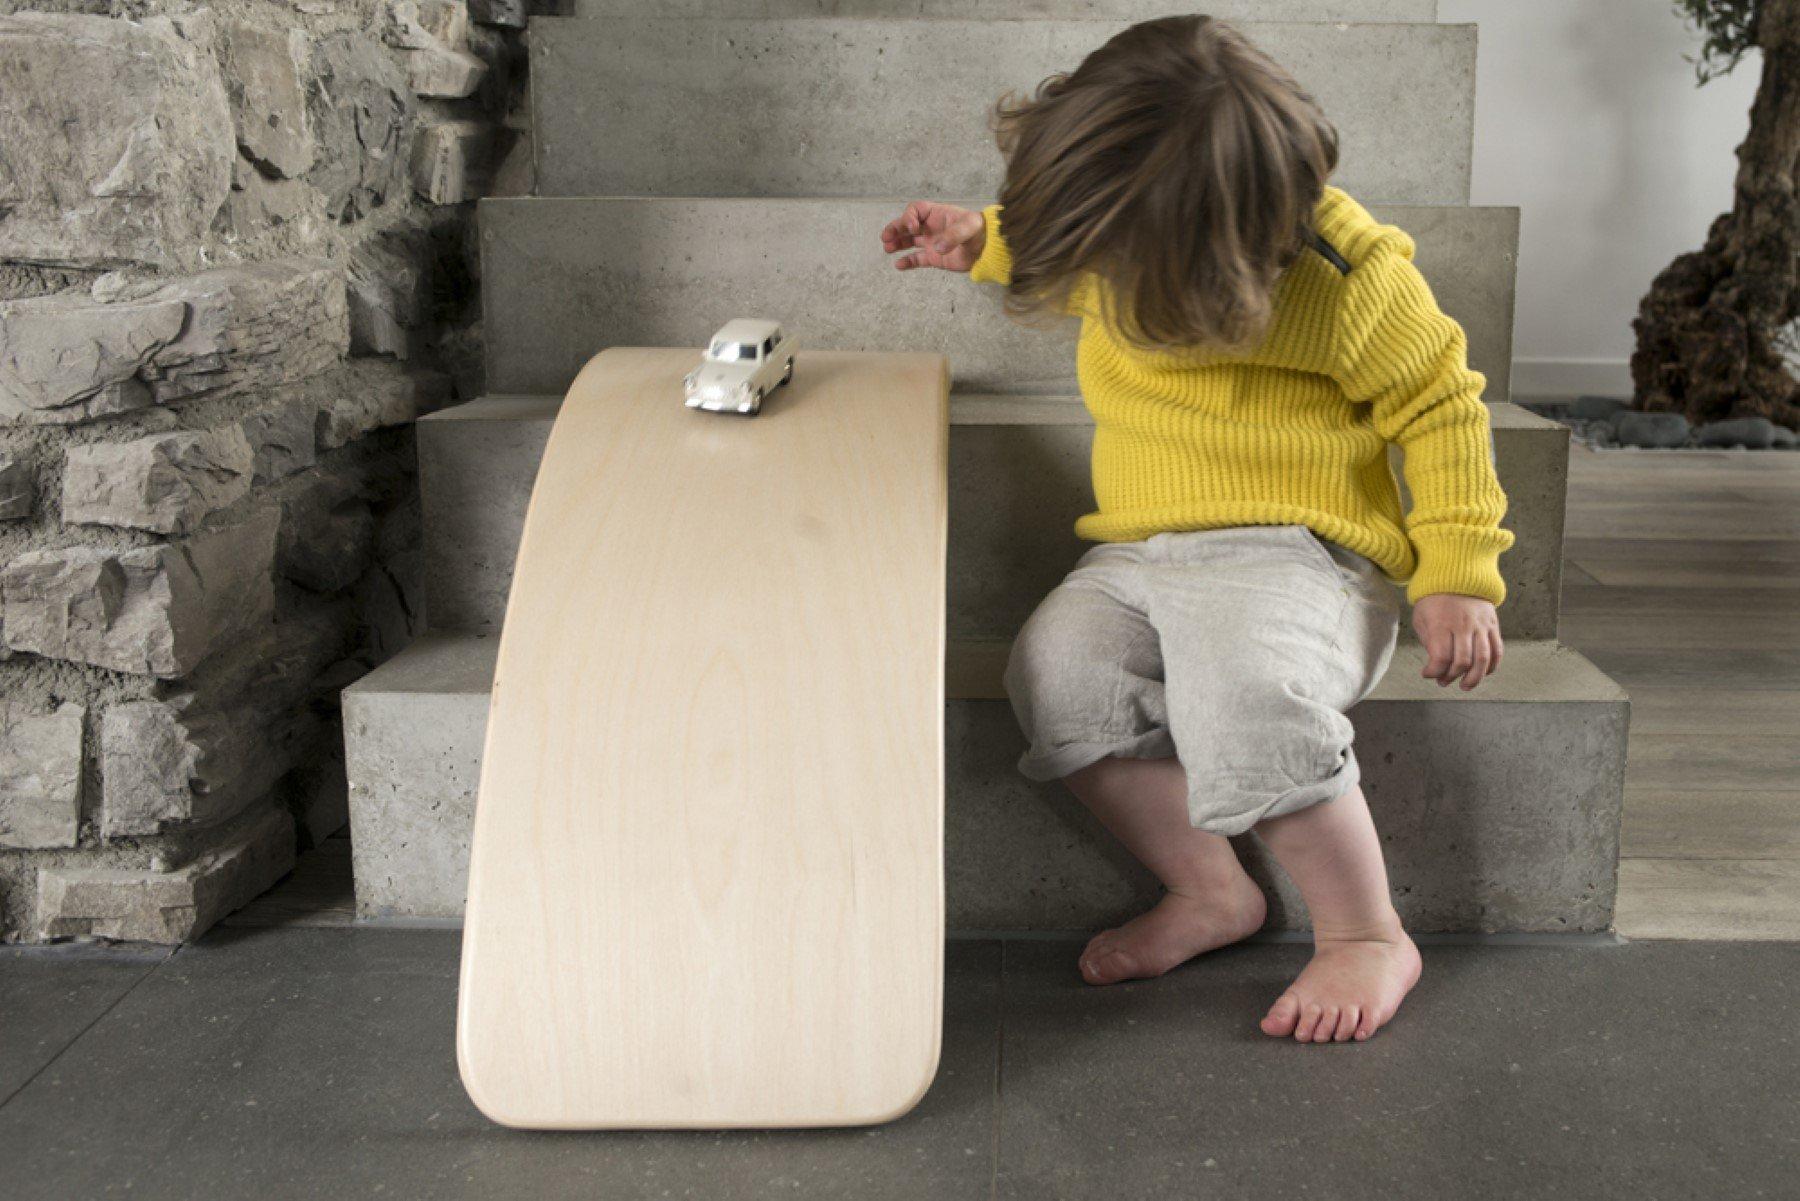 RocketBaby-wobbel-board-montessori36_fc44aa20-556d-4edd-8495-d7ab45075b5c